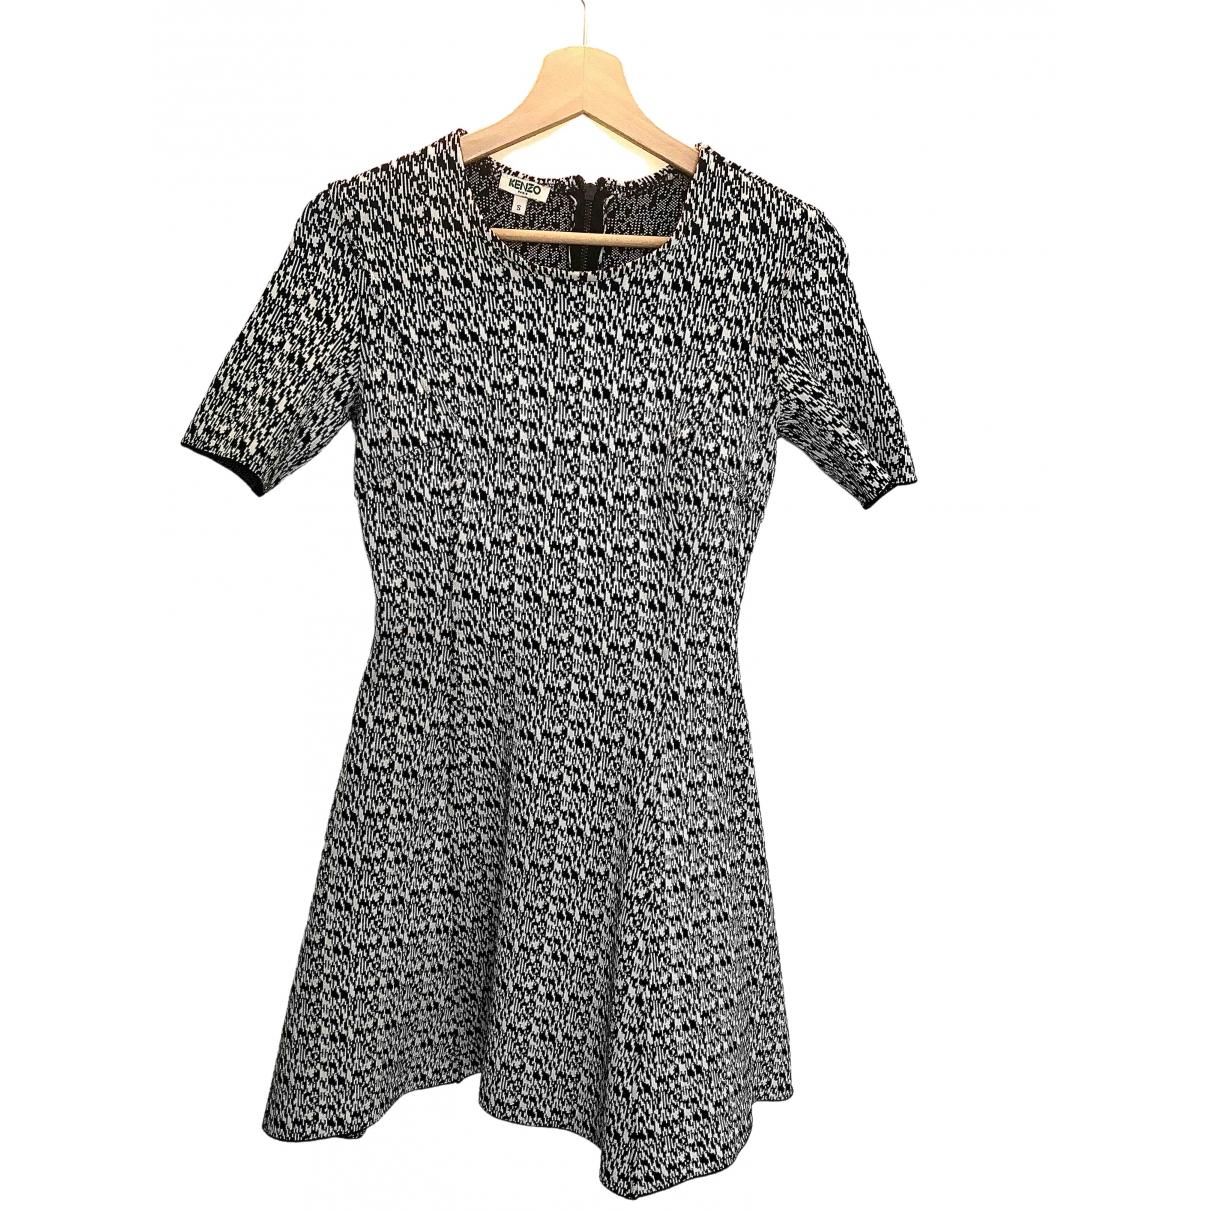 Kenzo \N Black Cotton - elasthane dress for Women S International